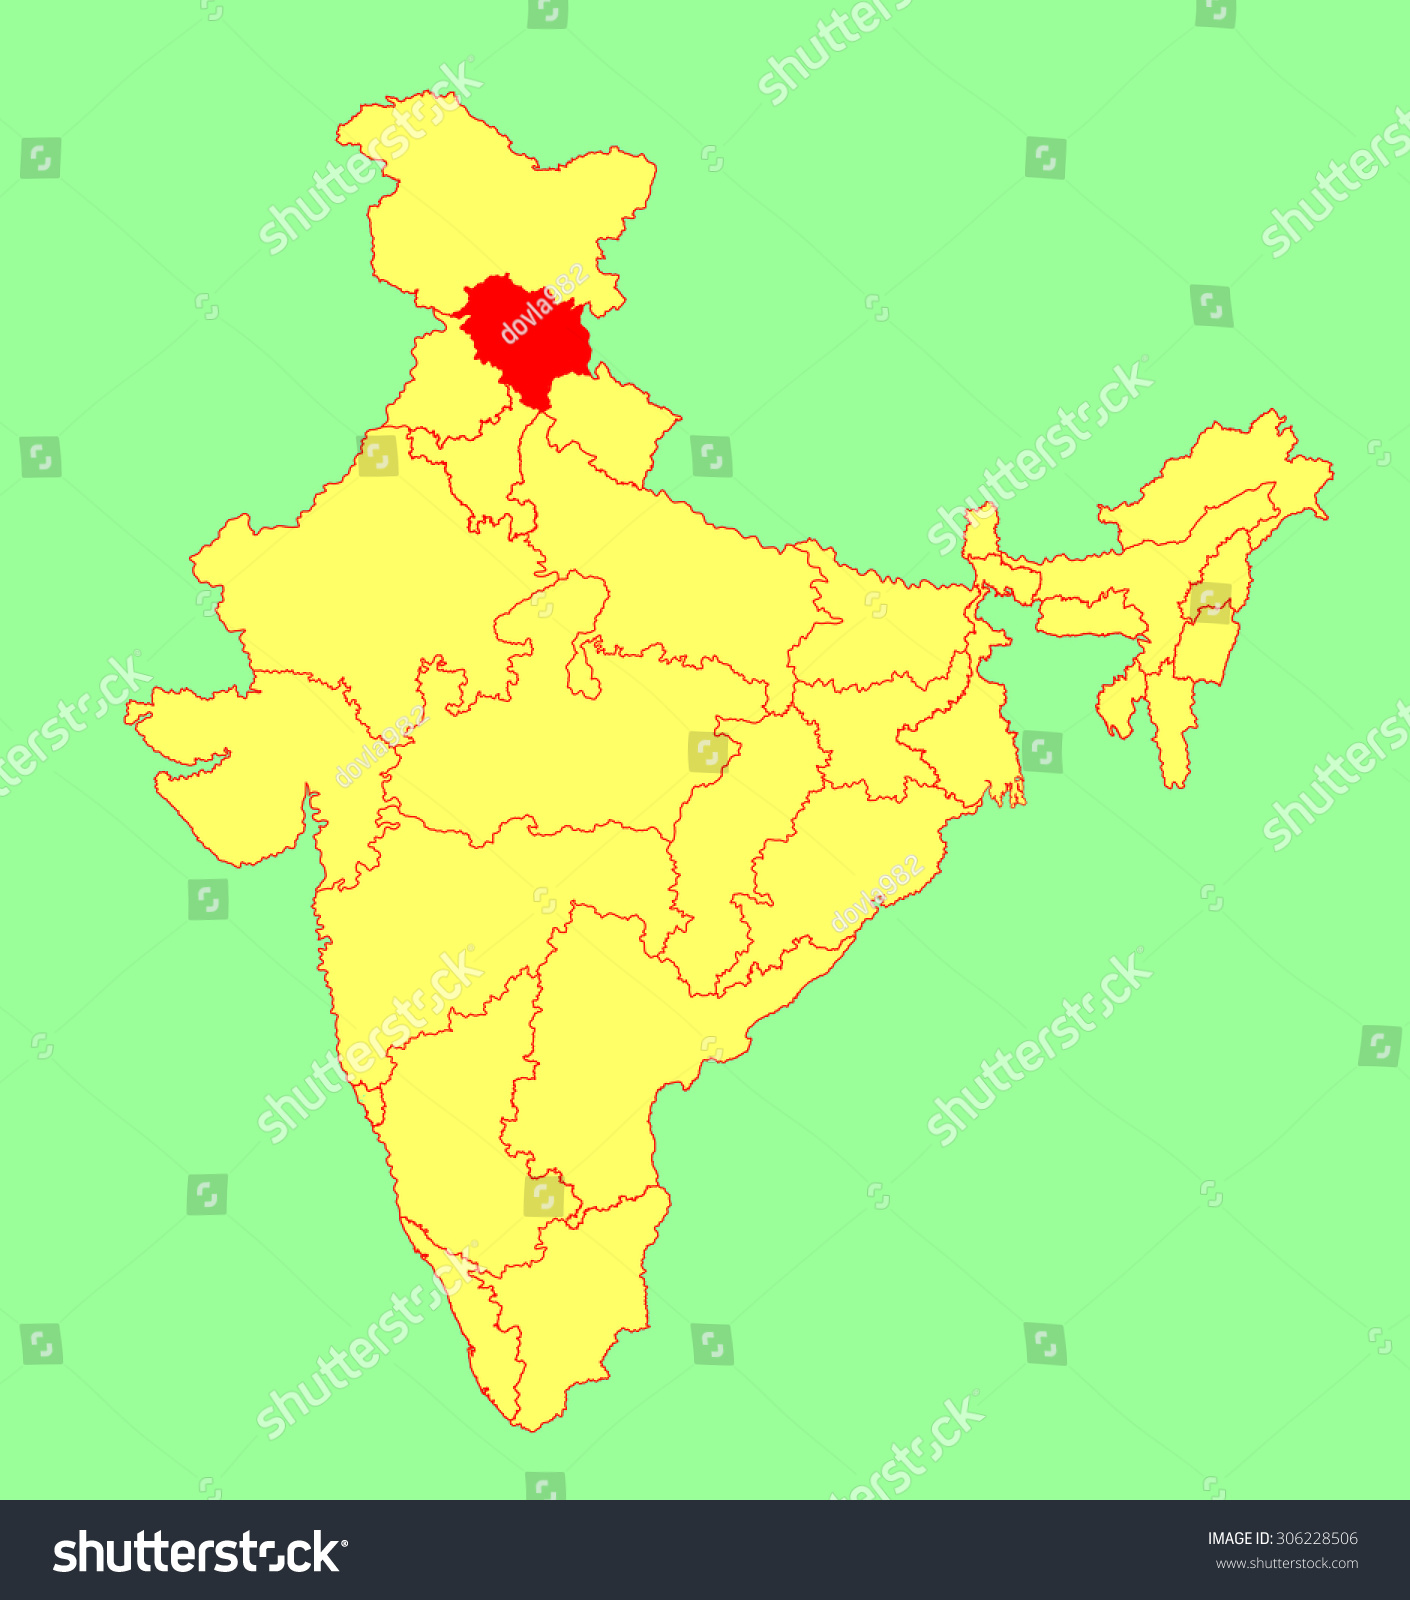 himachal pradesh state india vector map stock vector royalty free